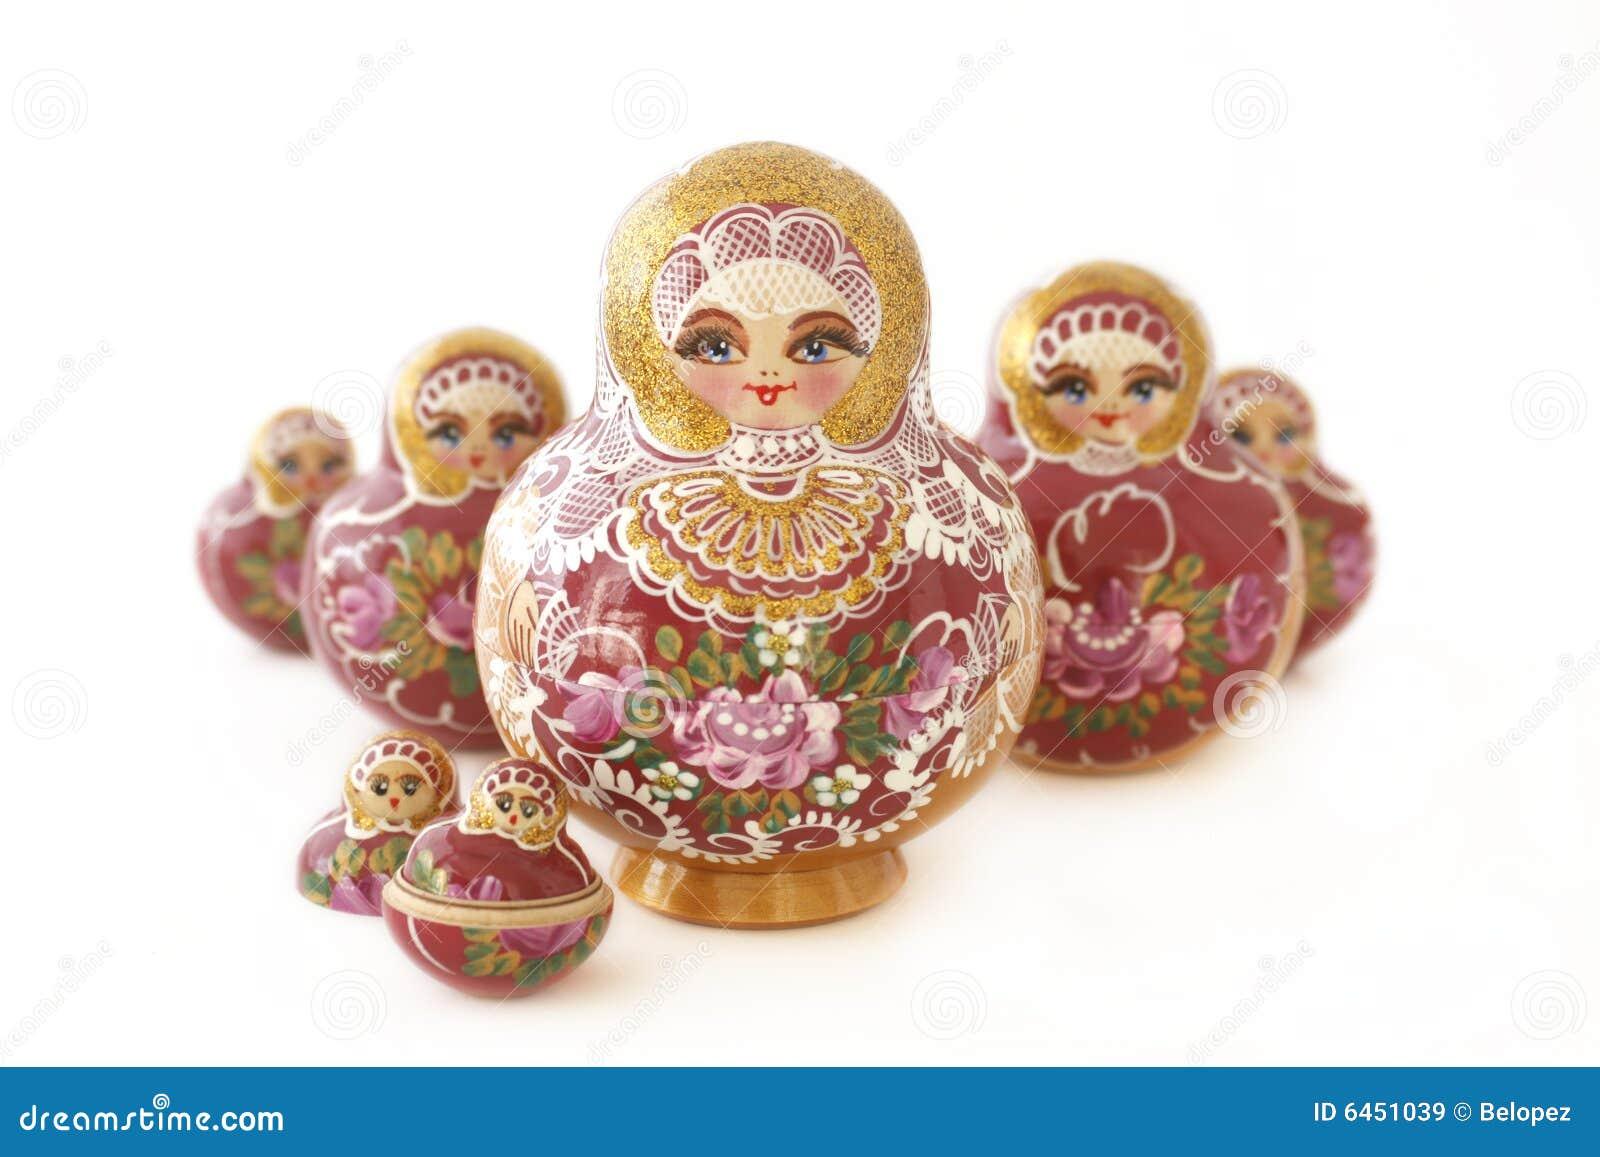 Lalka rosyjski kształt v